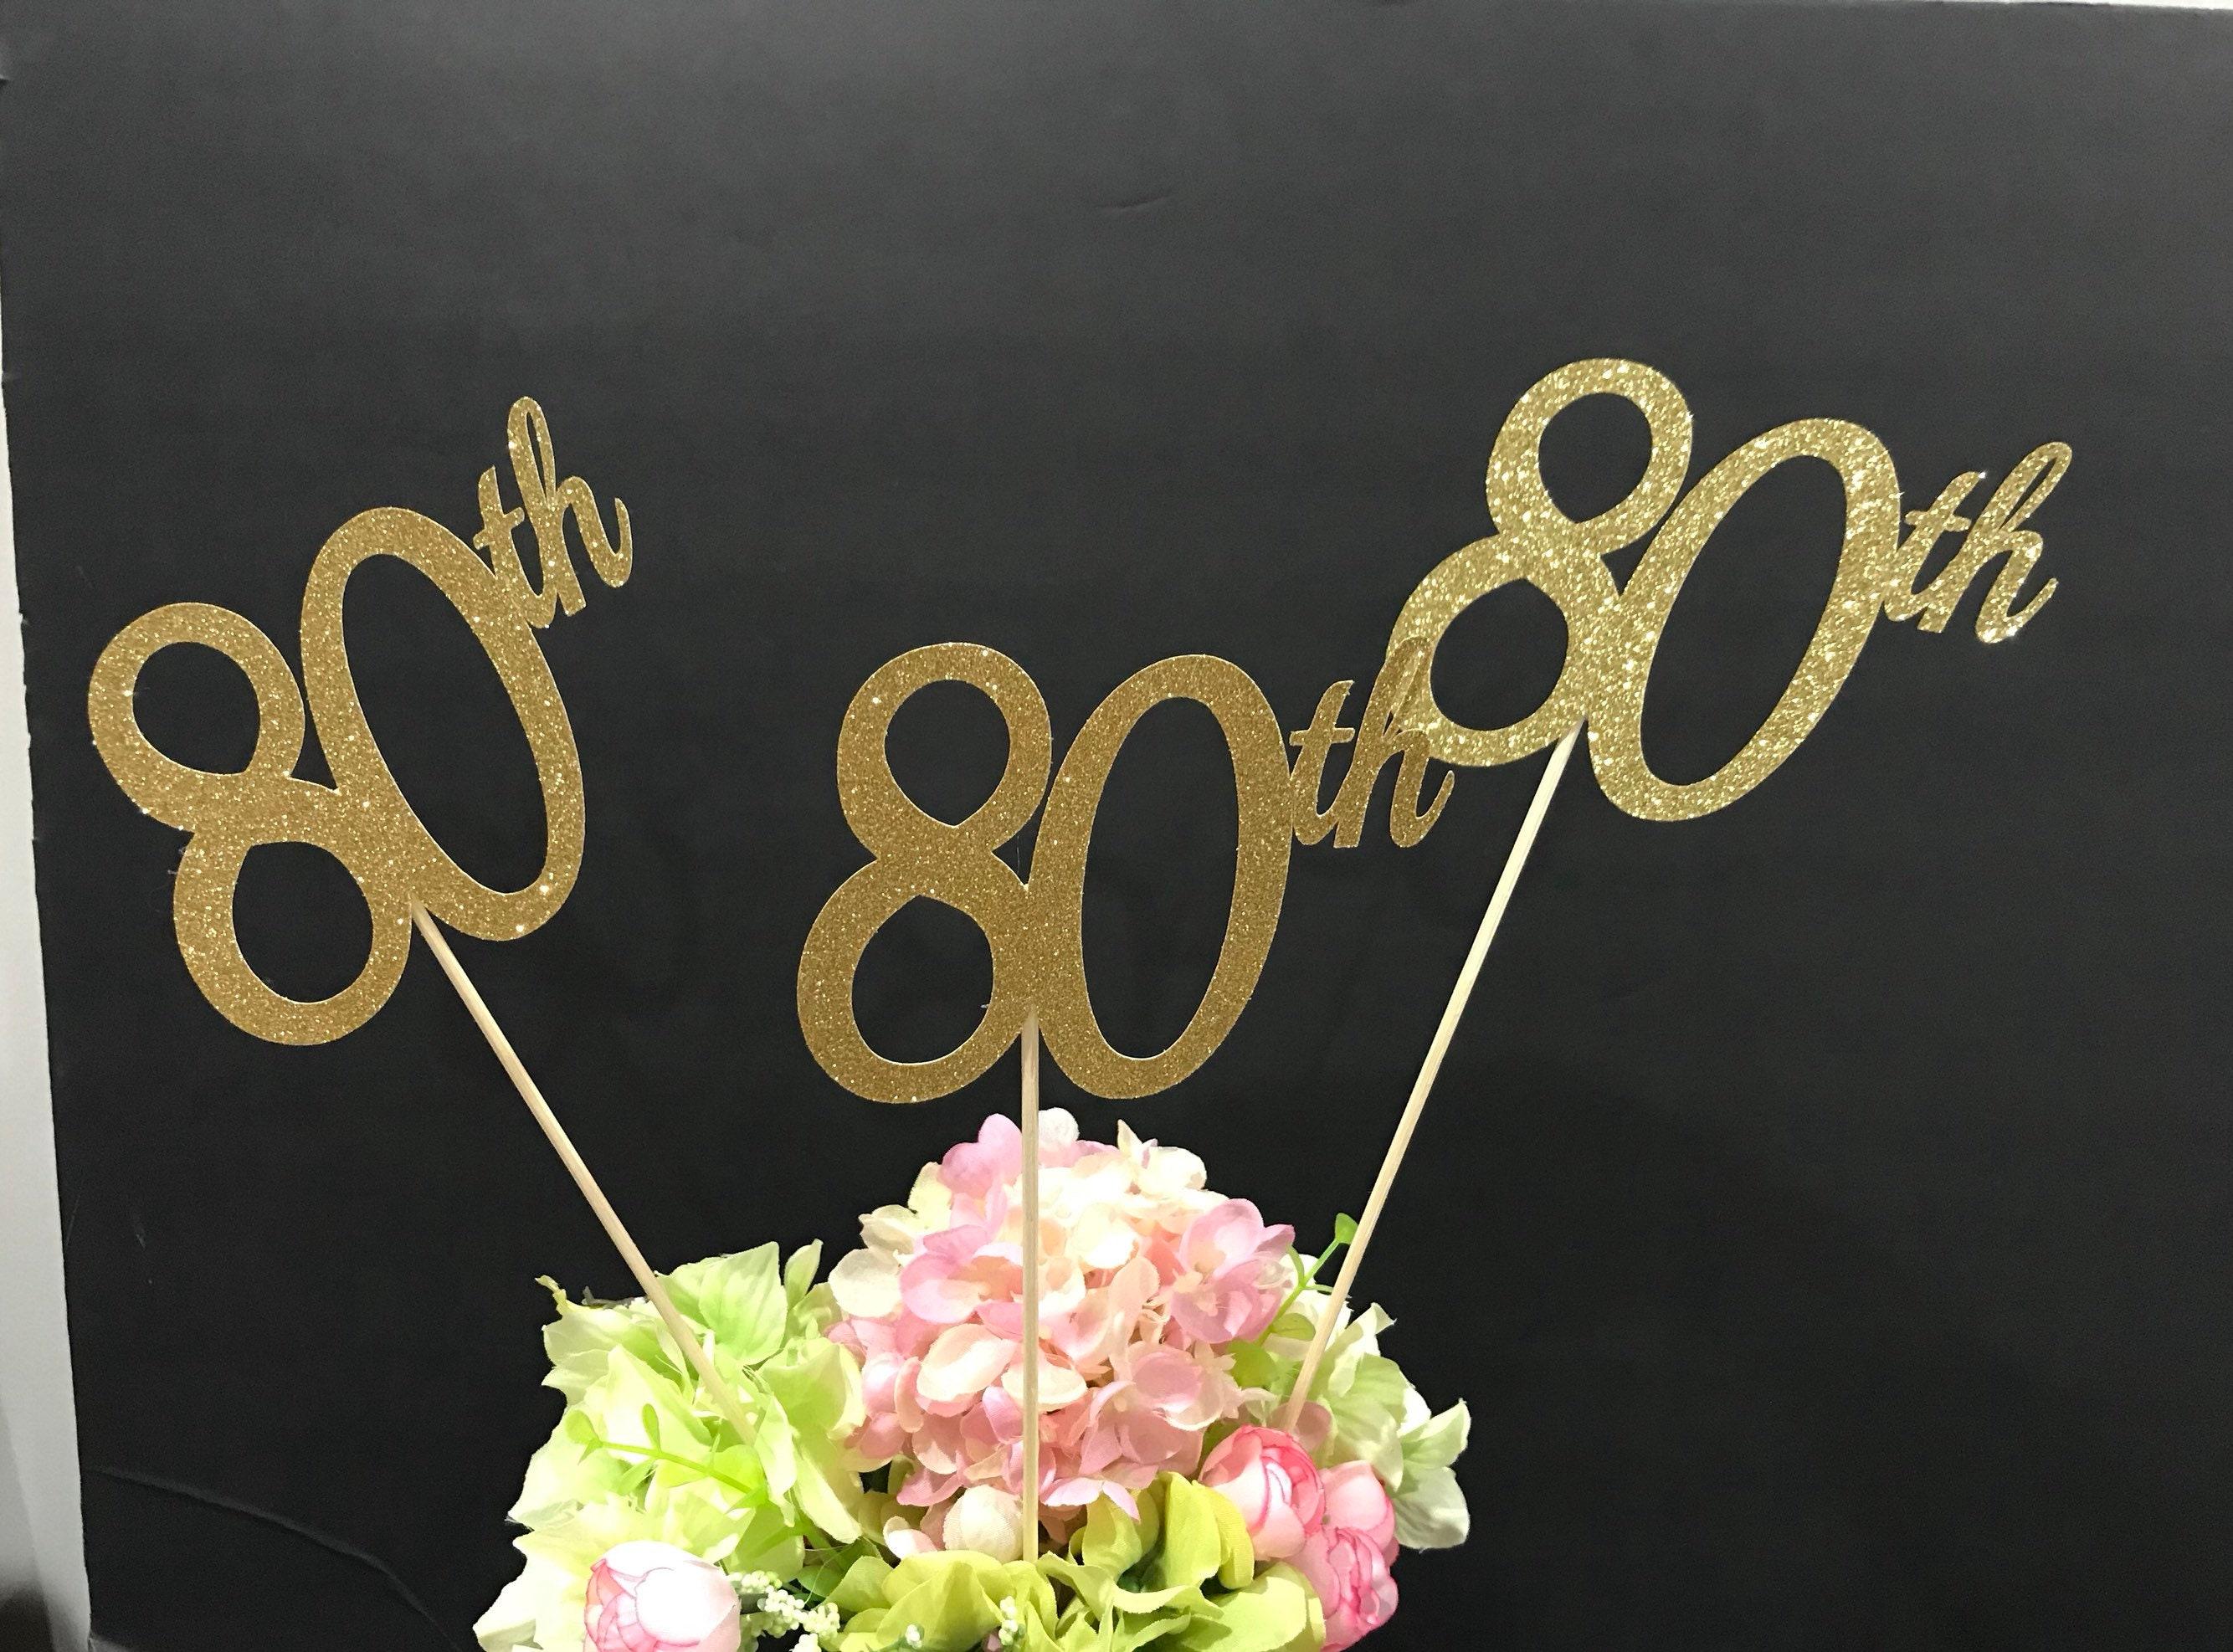 80th Birthday Decorations Centerpiece Sticks Glitter 80 Table Age Anniversary Stick